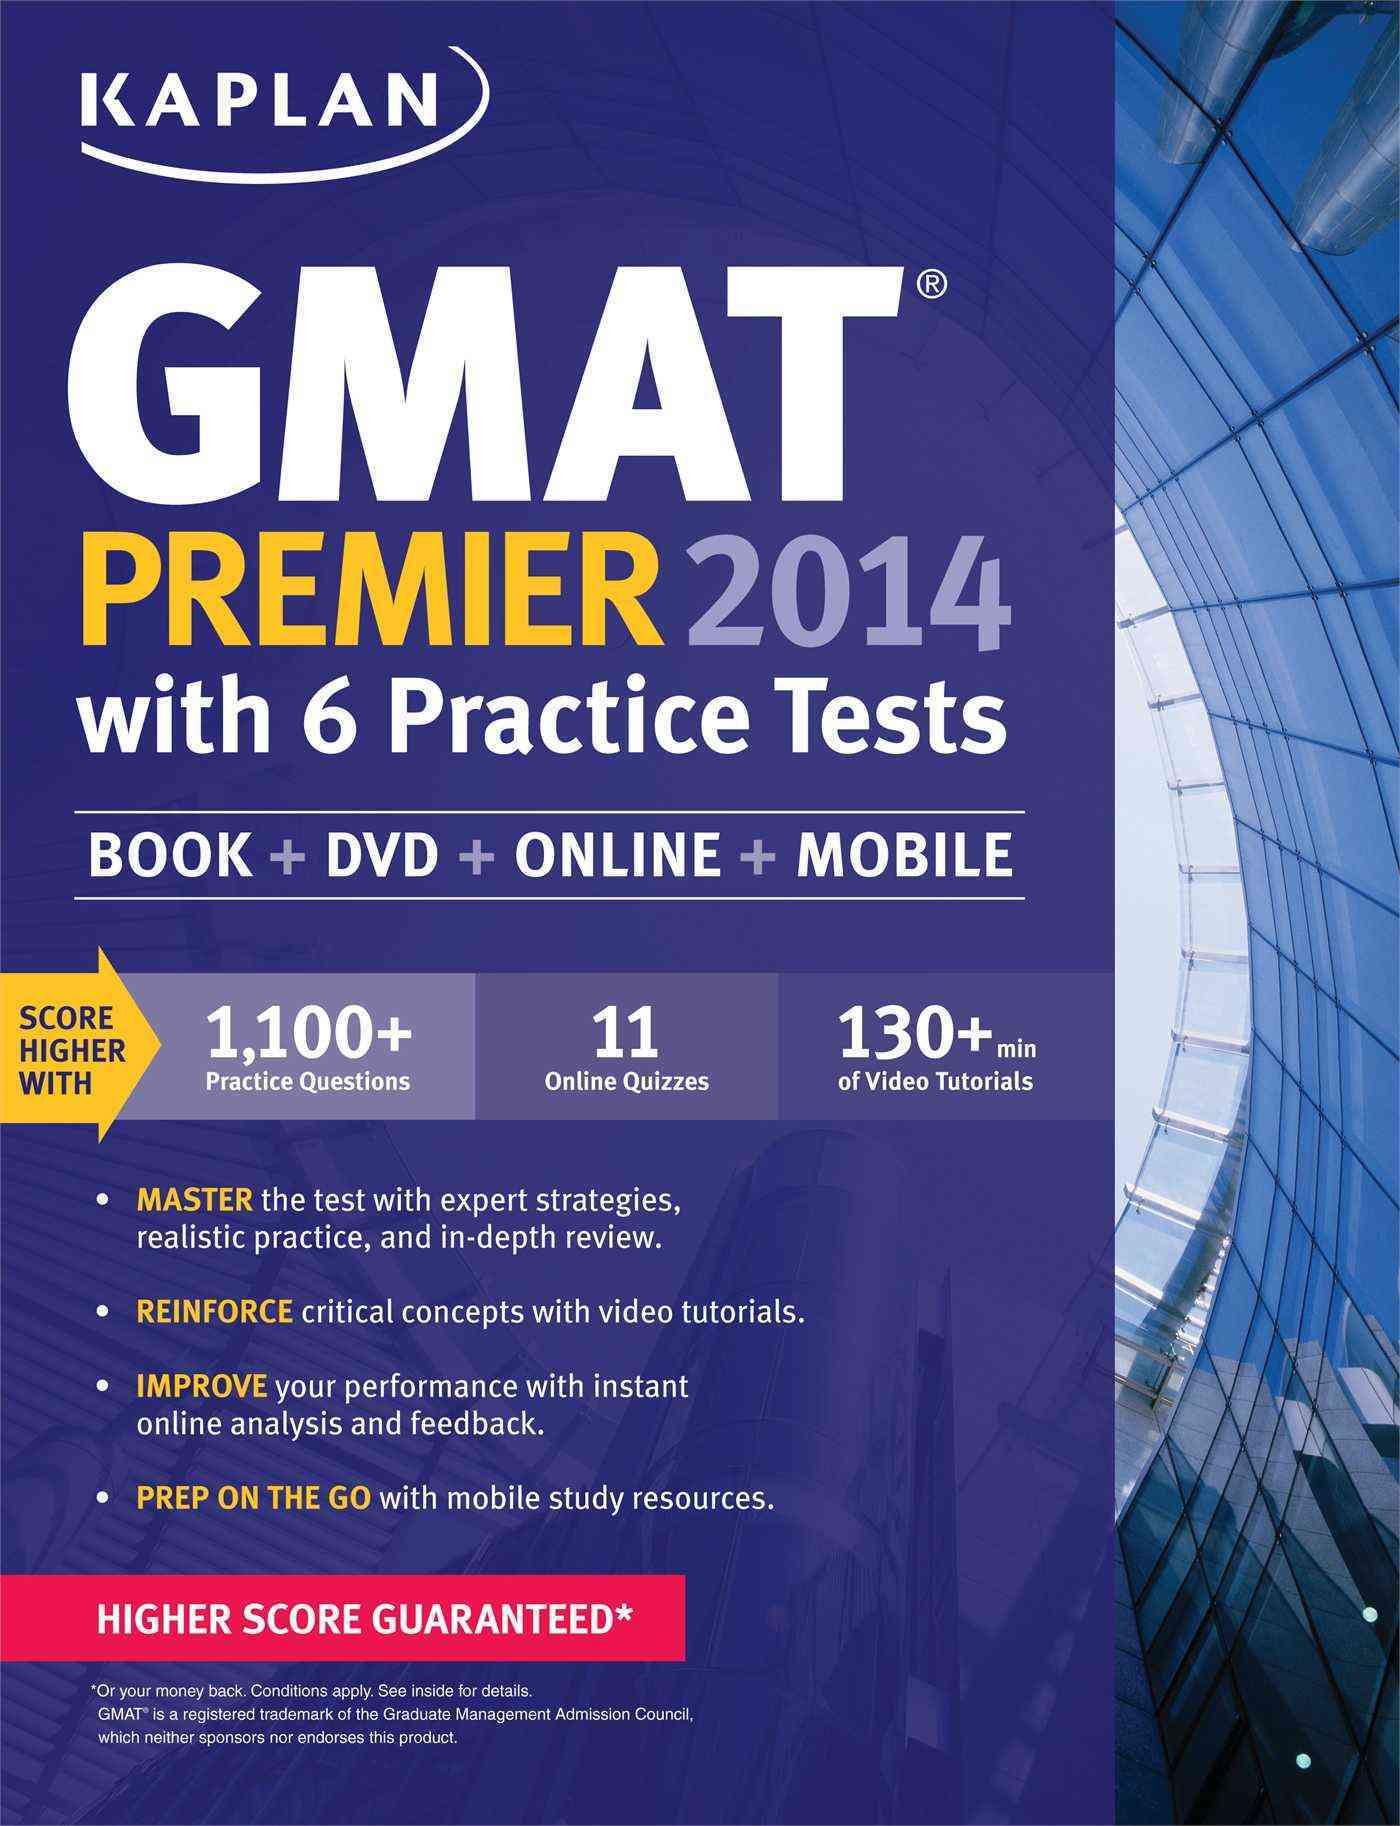 Kaplan GMAT Premier 2014: With 6 Practice Tests